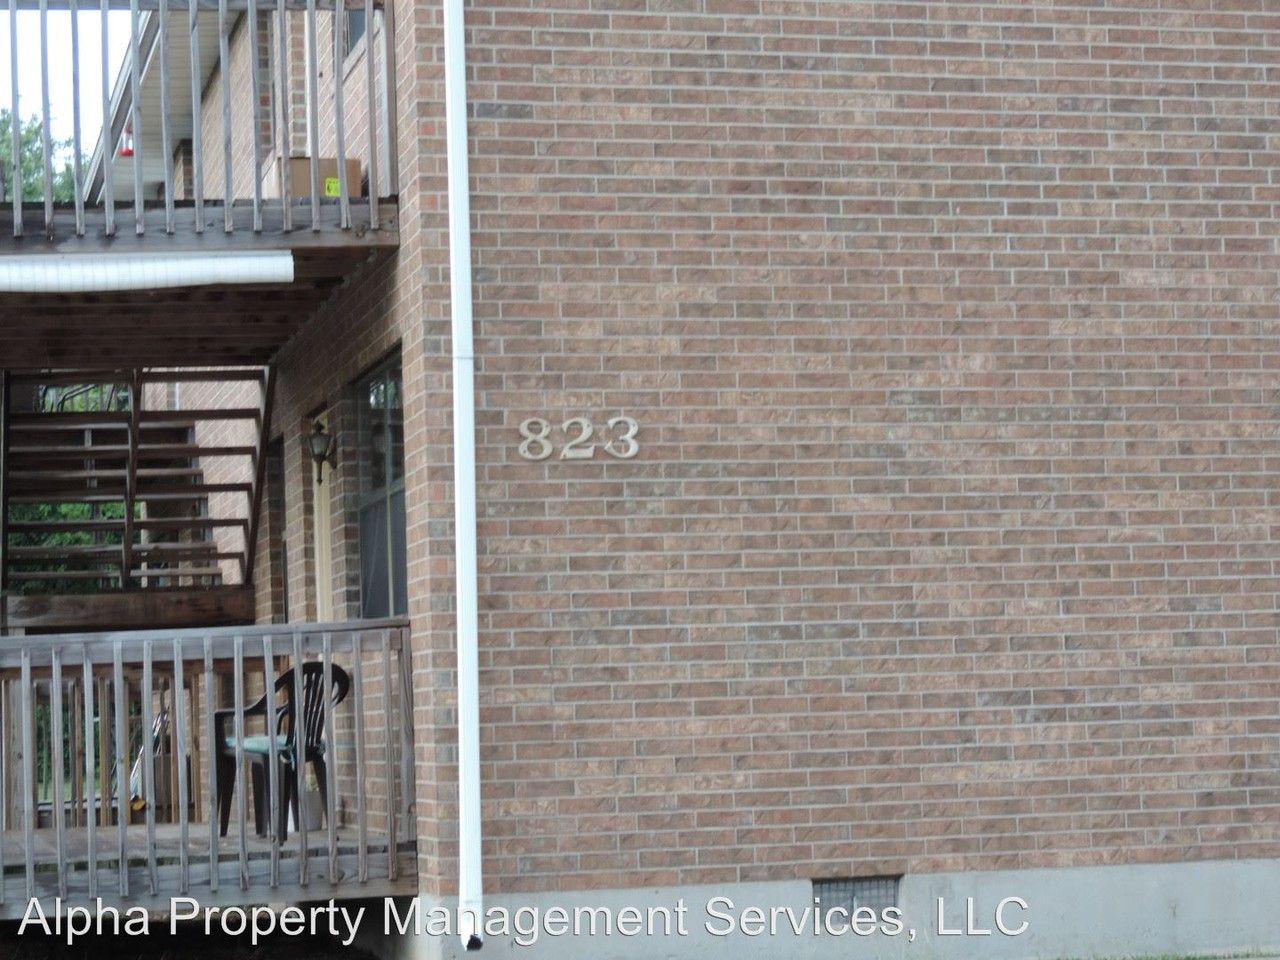 823 Sunflower Warrensburg Mo 64093 2 Bedroom Apartment For Rent